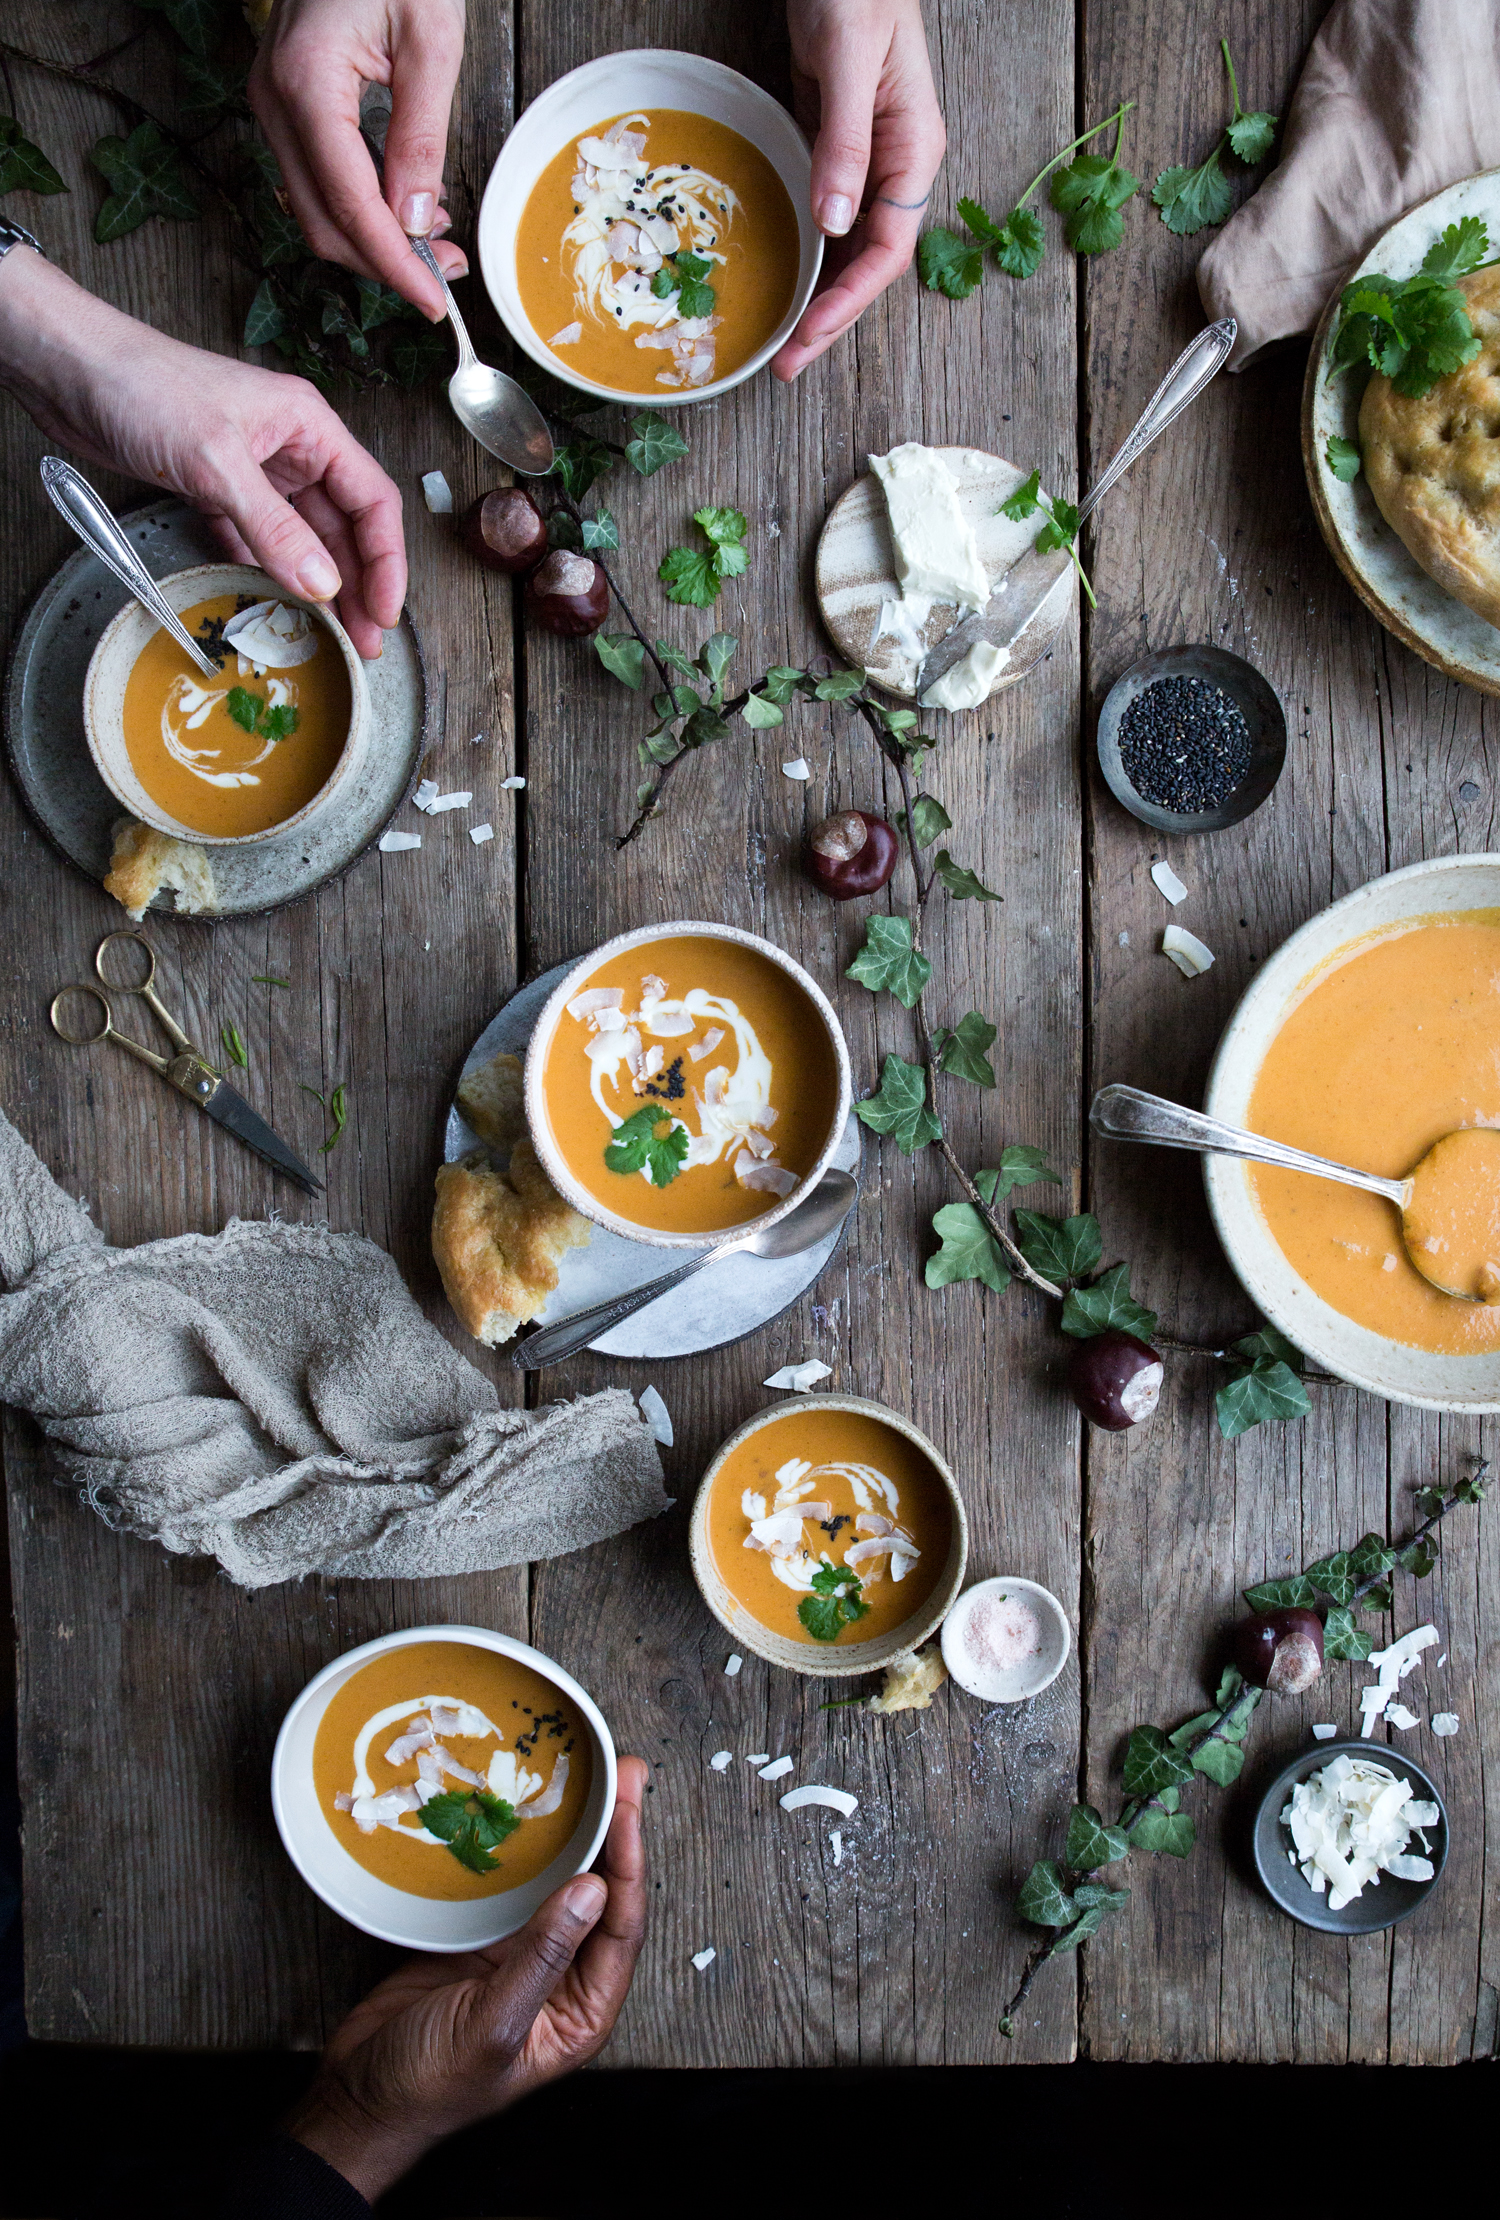 Learn food styling in London - The Little Plantation